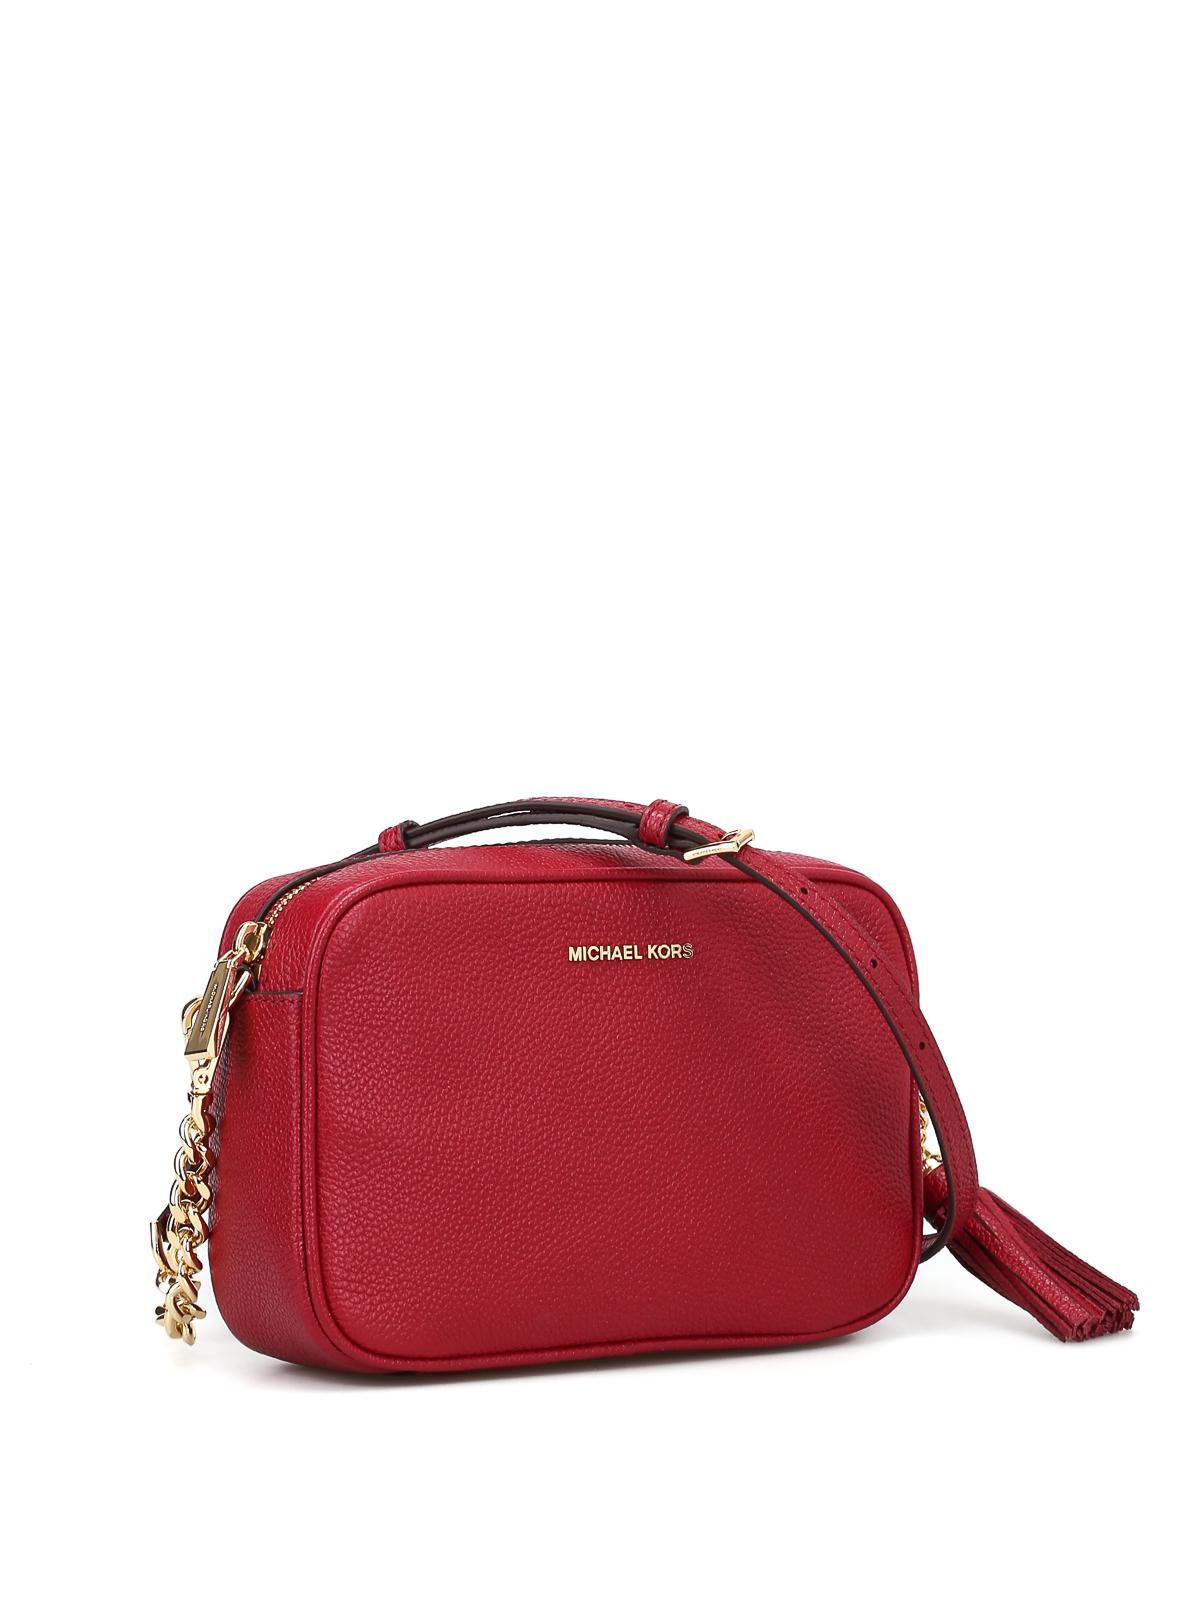 7424627f8d4c Michael Kors - Ginny medium camera bag - cross body bags - 32F7GGNM8L550